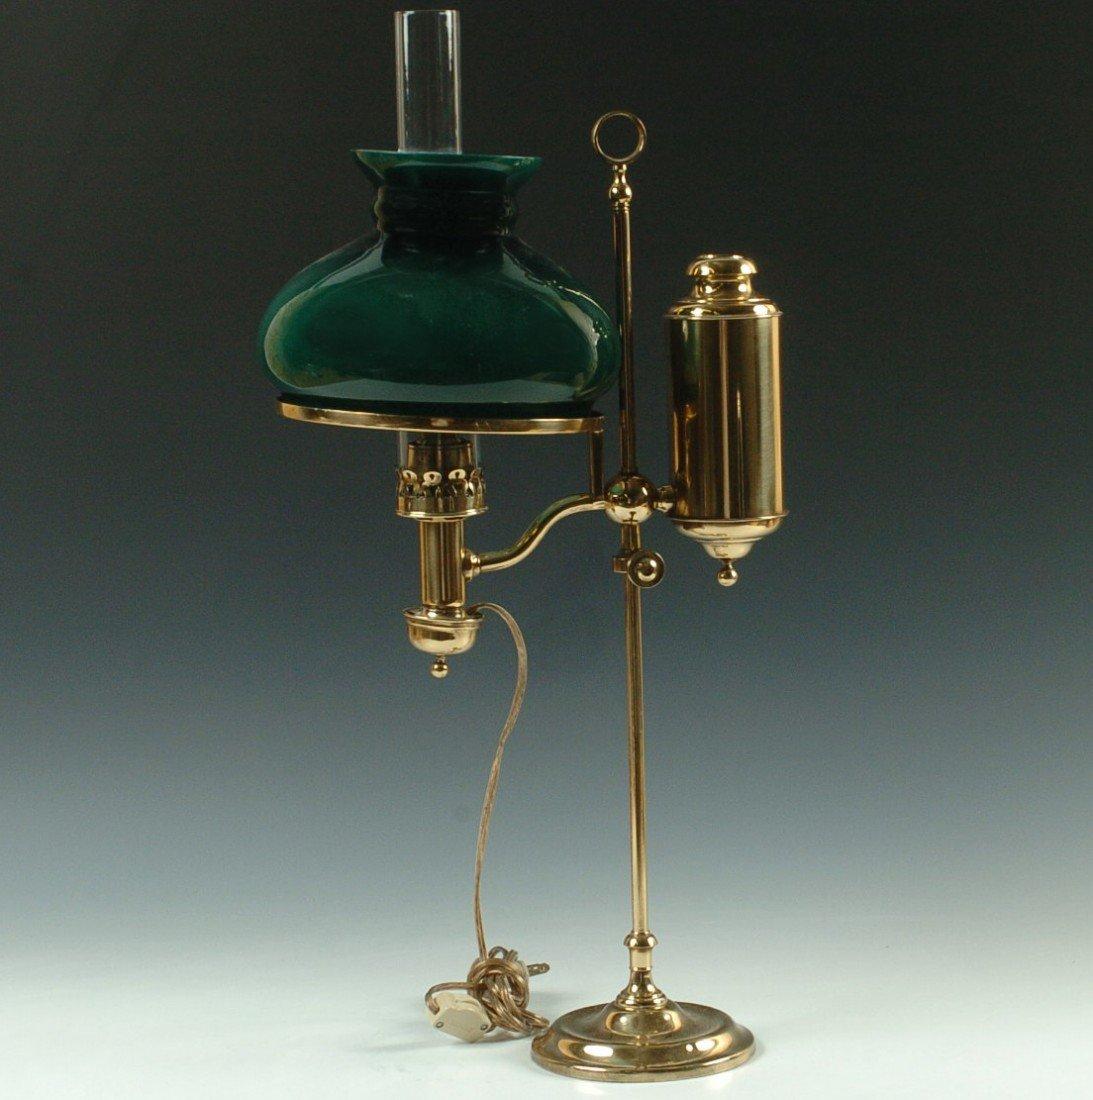 THE GERMAN STUDENT LAMP CO. ANTIQUE LAMP C. 1870